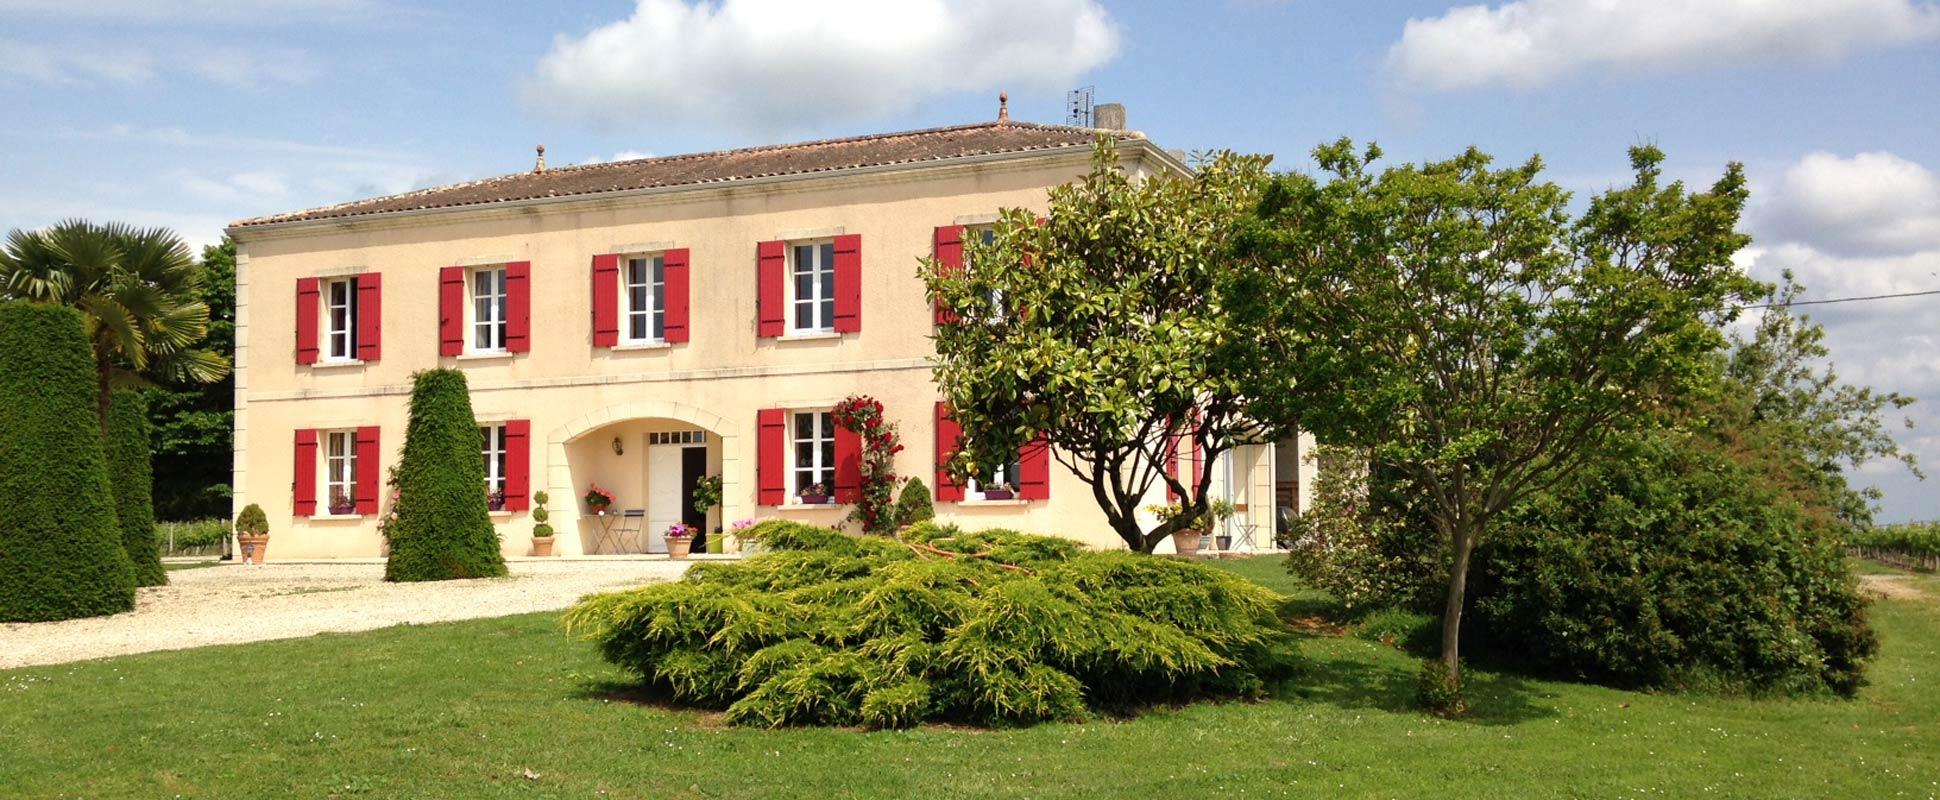 Chateau-Le-Camplat